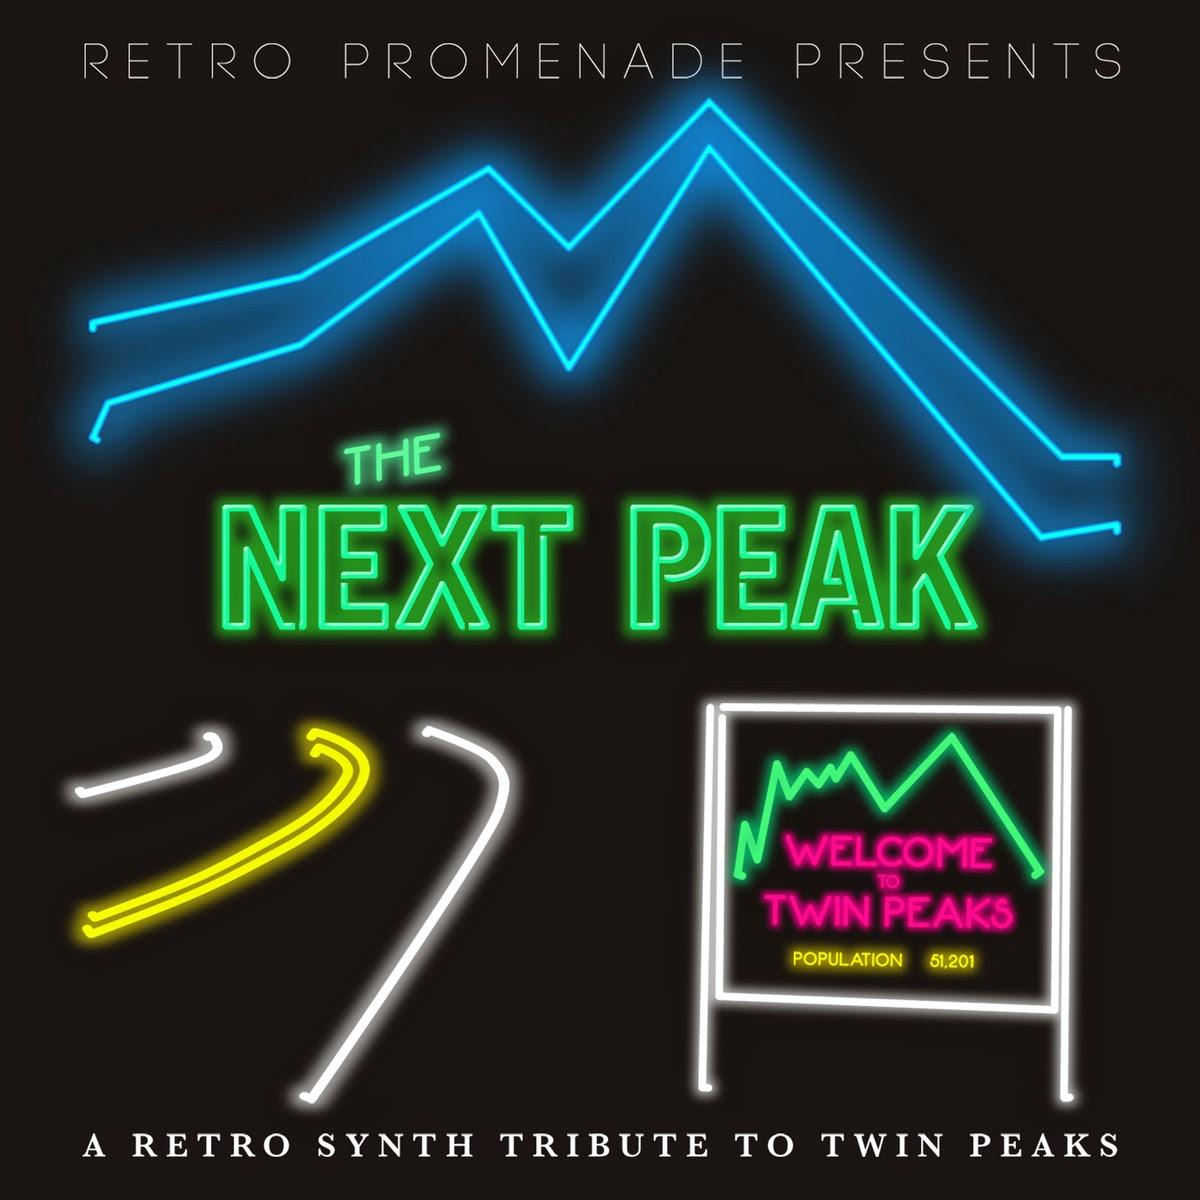 https://retropromenade.bandcamp.com/album/the-next-peak-vol-i-twin-peaks-tribute